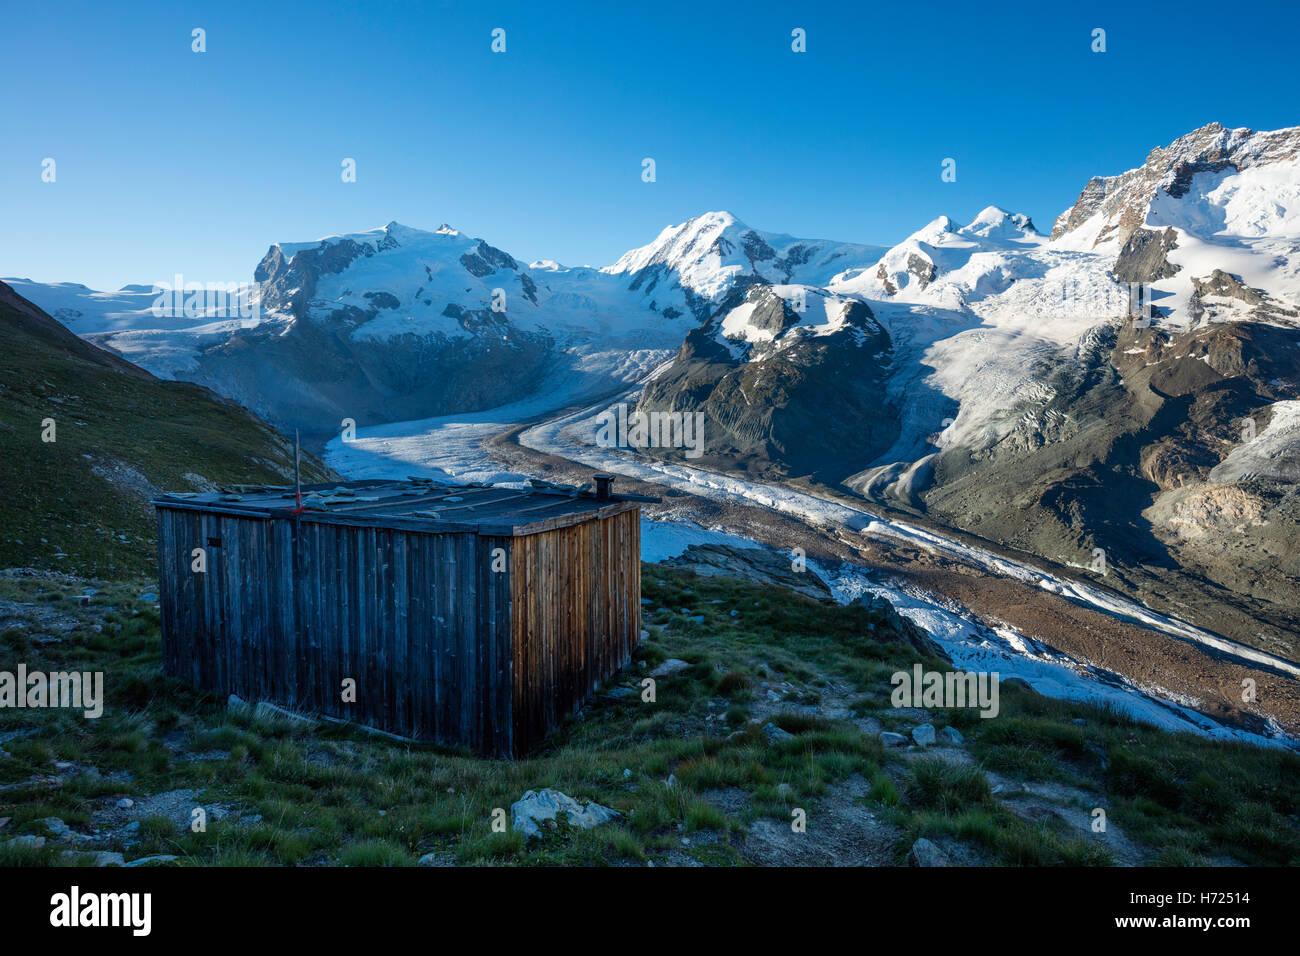 Capanna in legno sopra il ghiacciaio Gorner, Zermatt, Pennine, Vallese, Svizzera. Foto Stock